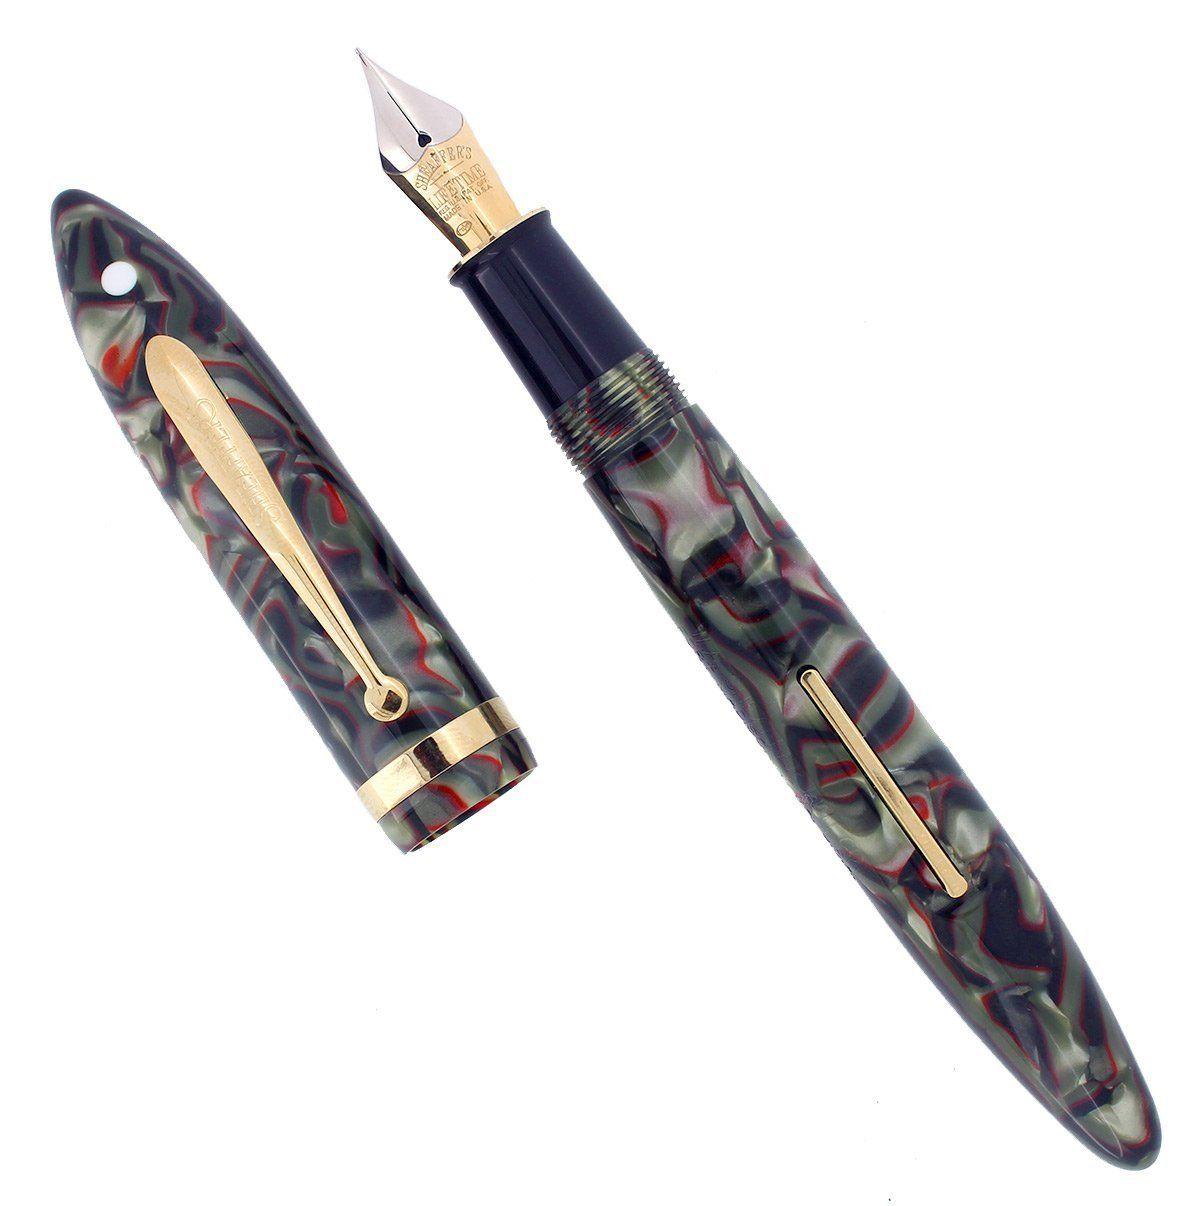 Silver Ripple Medium nib fountain pen new